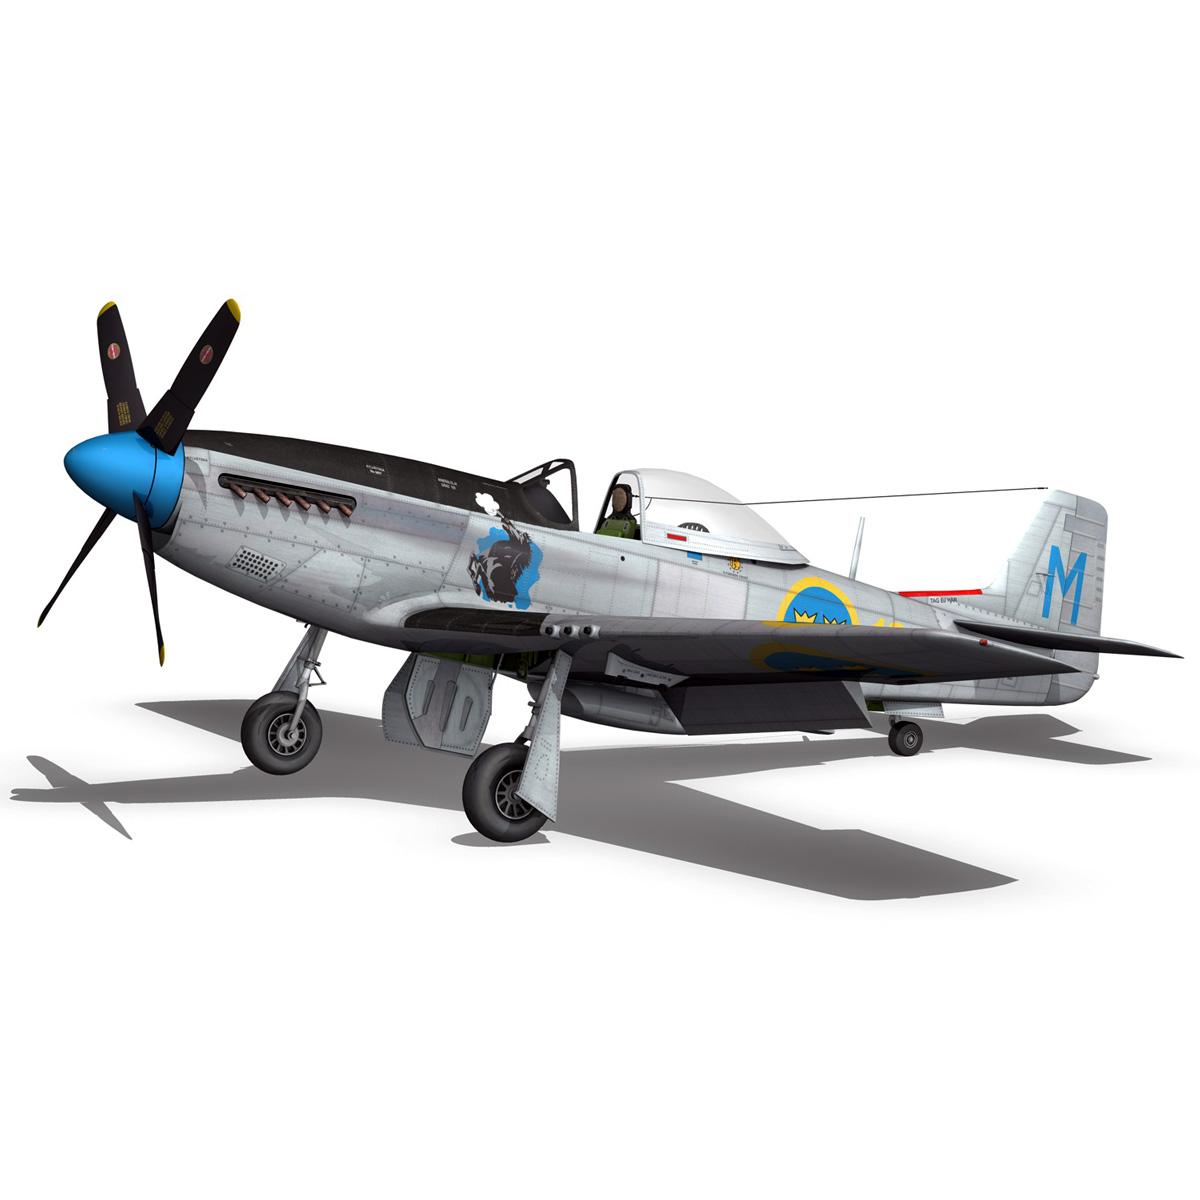 north american p-51d mustang – swedisch airforce 3d model fbx c4d lwo obj 268237